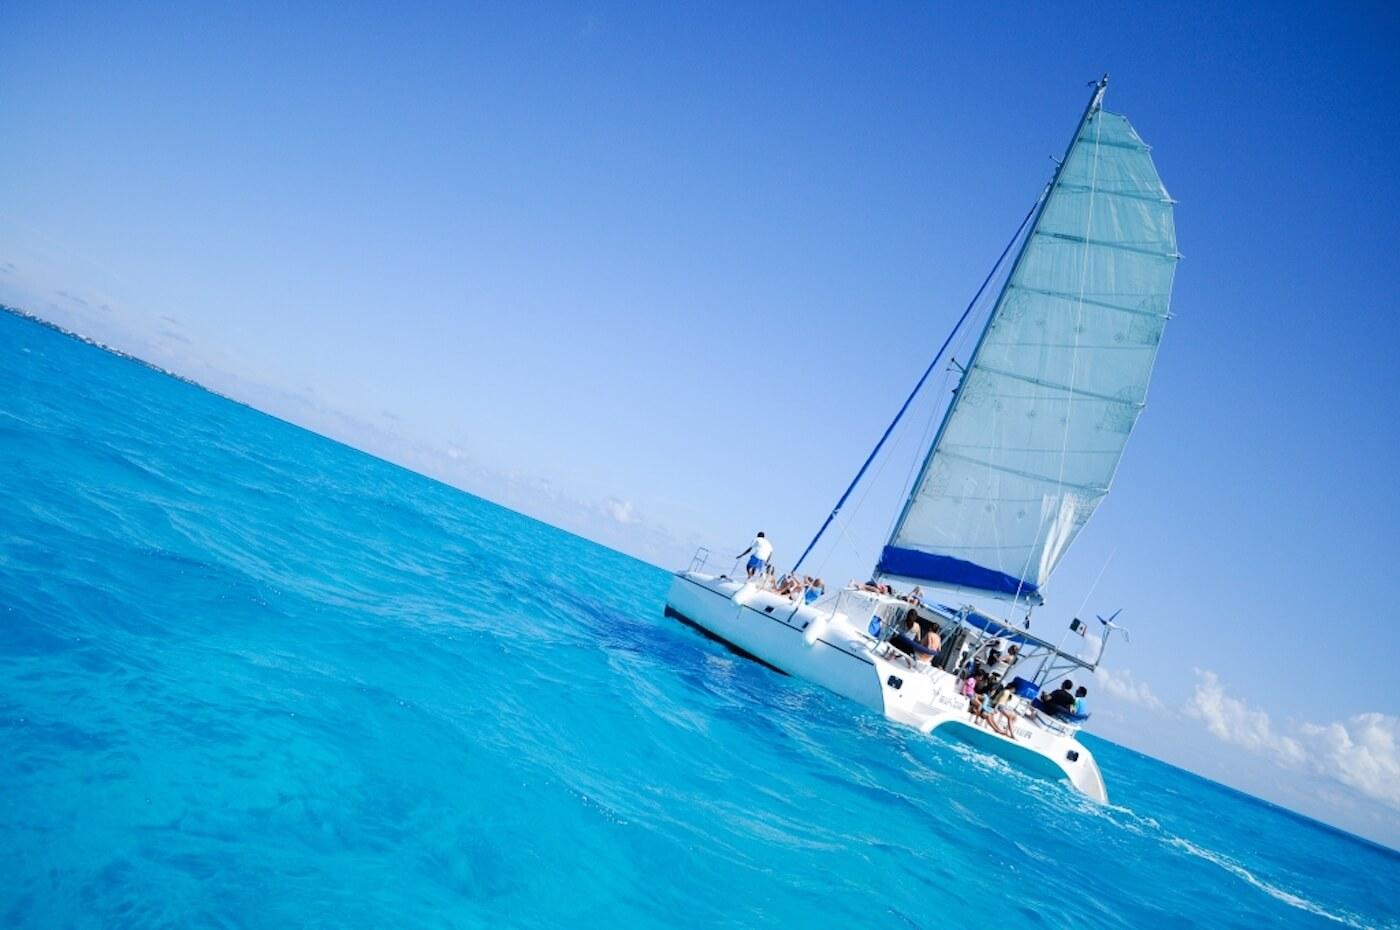 Catamaran-Snorkel-Trips-Cancun-Isla-Mujeres-13